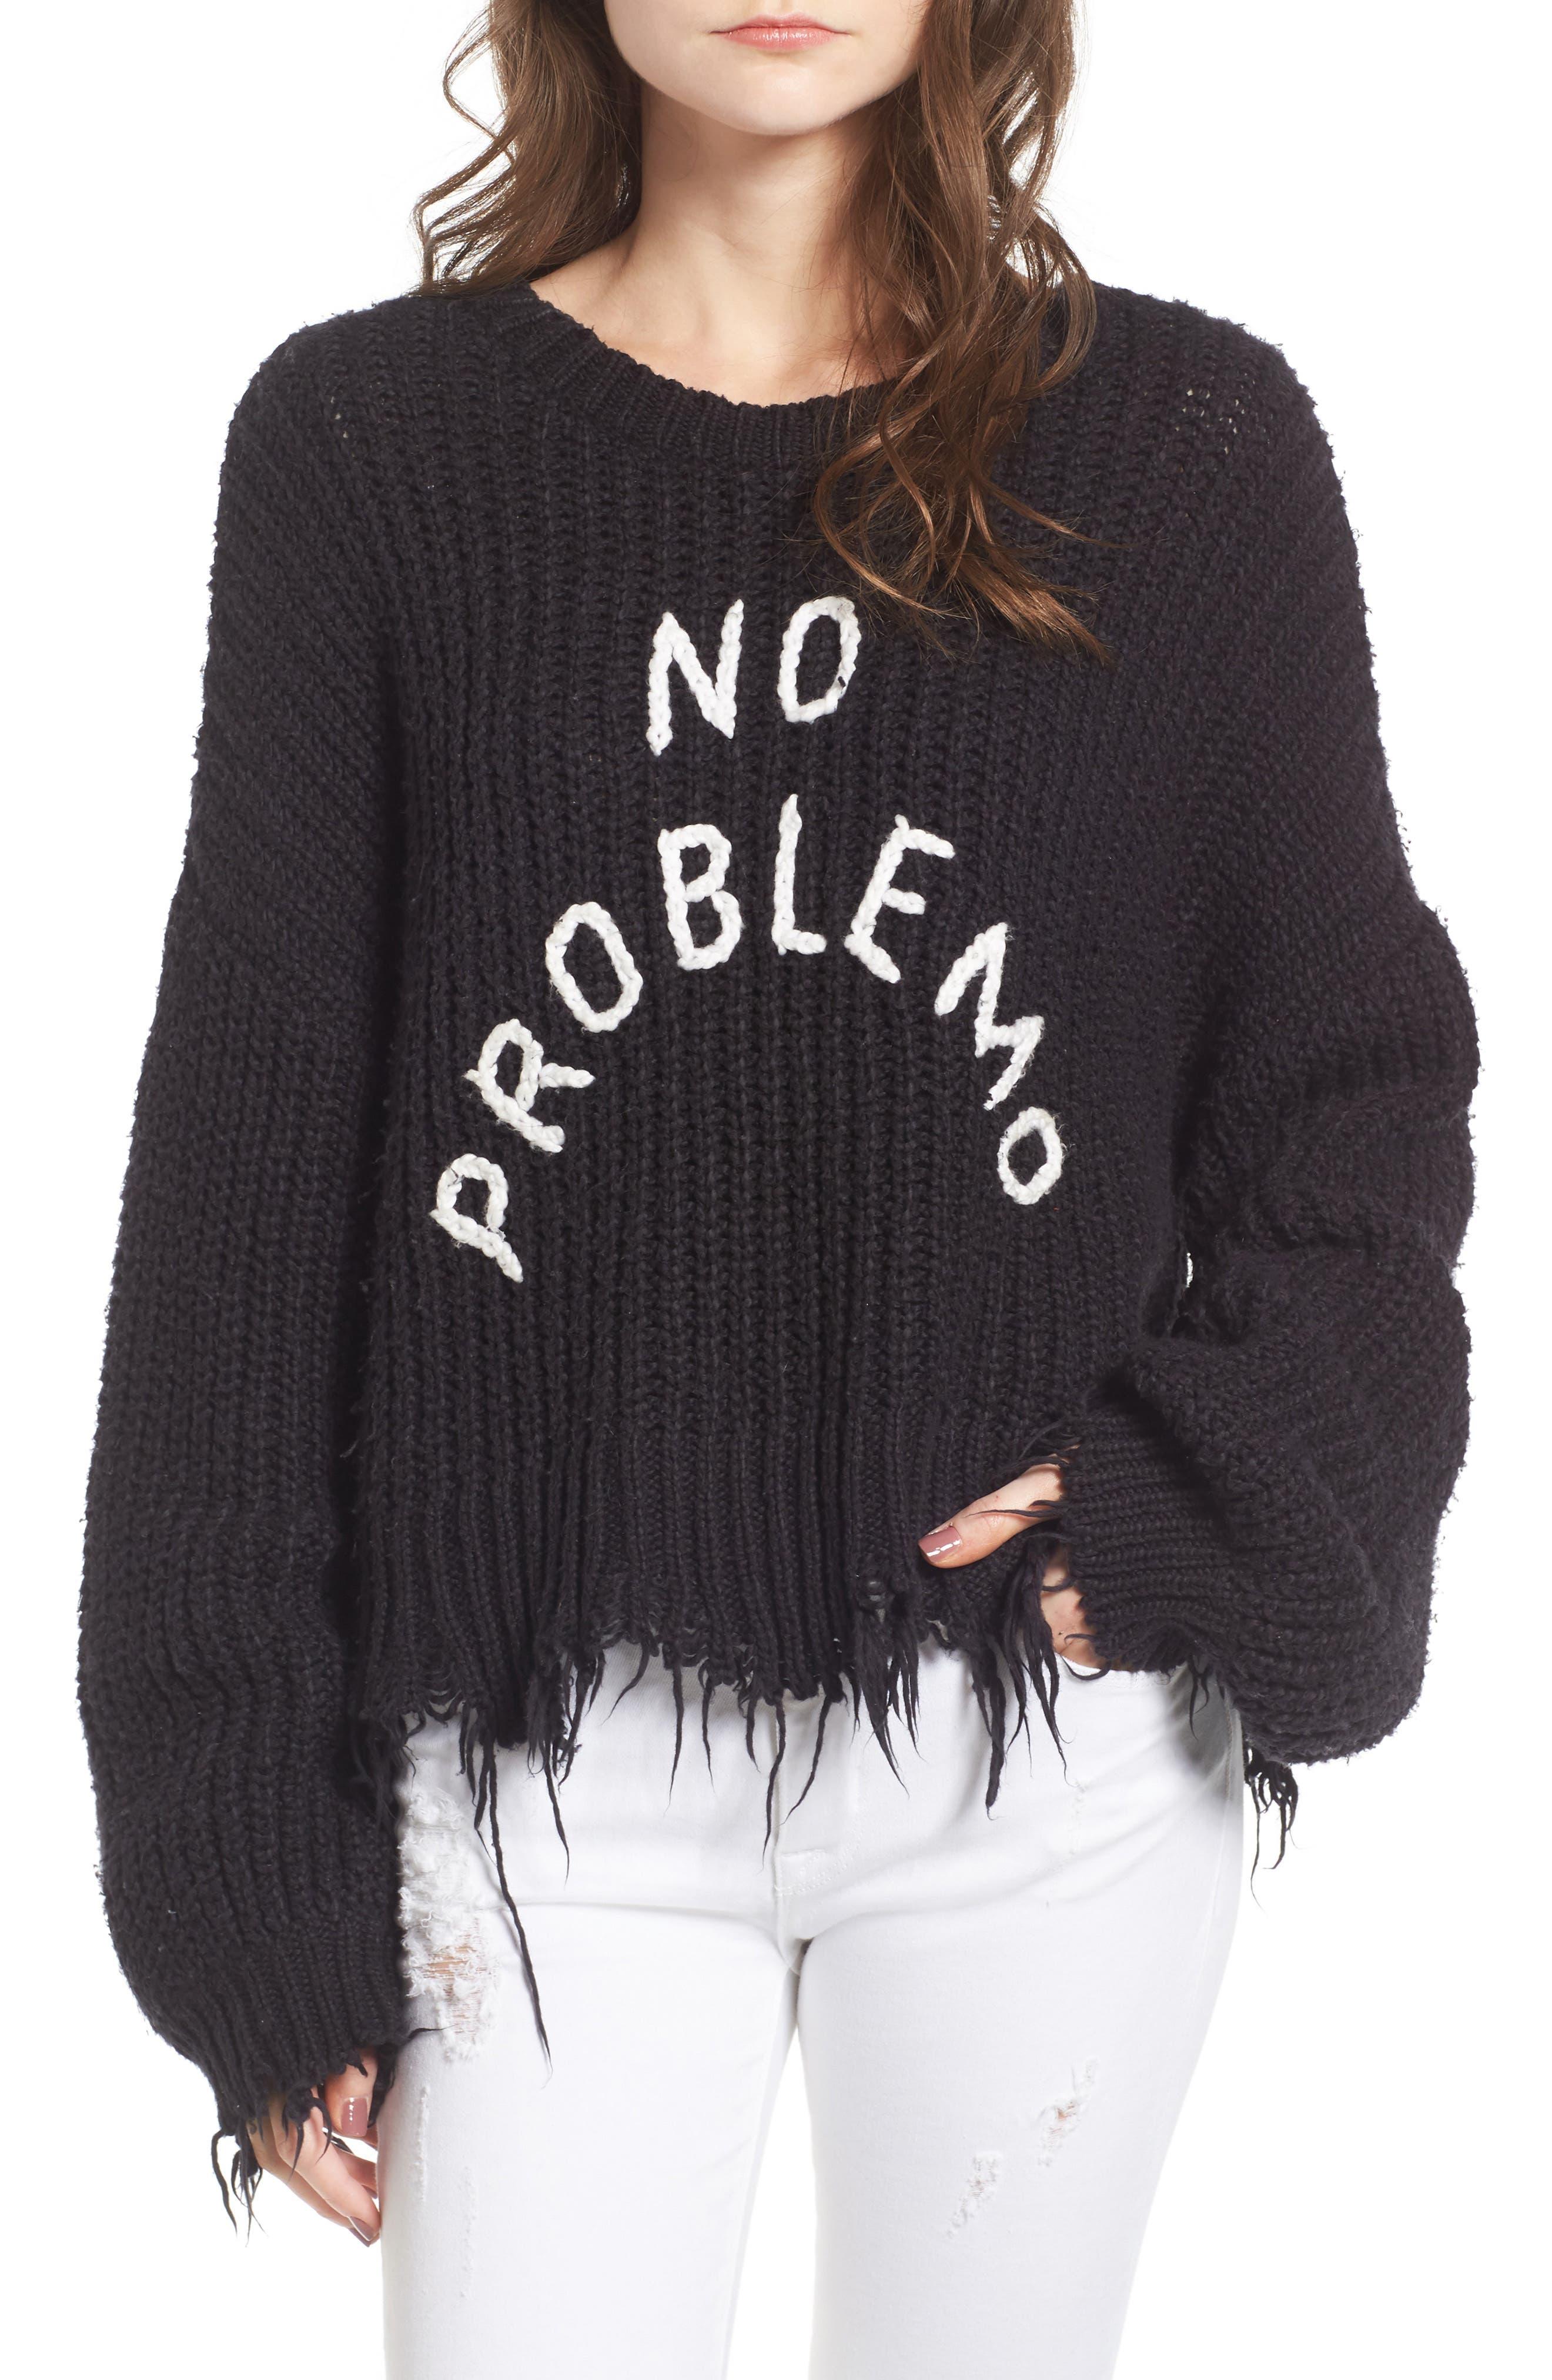 Main Image - Wildfox No Problemo Sweater